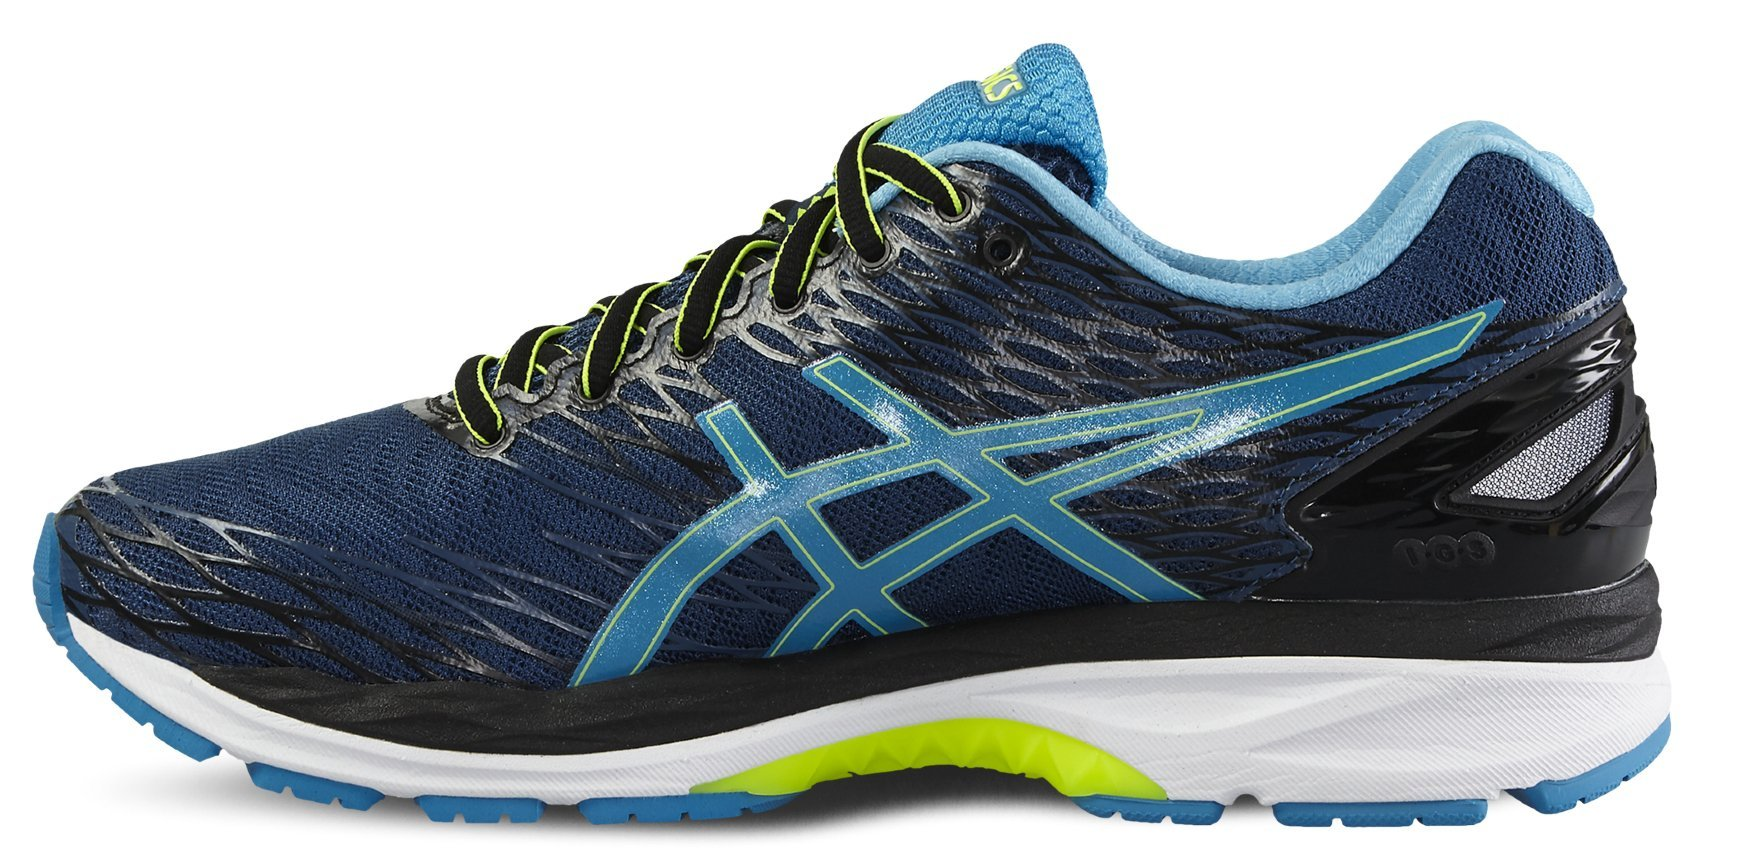 ASICS GEL-NIMBUS 18 мужские кроссовки для бега темно-синие